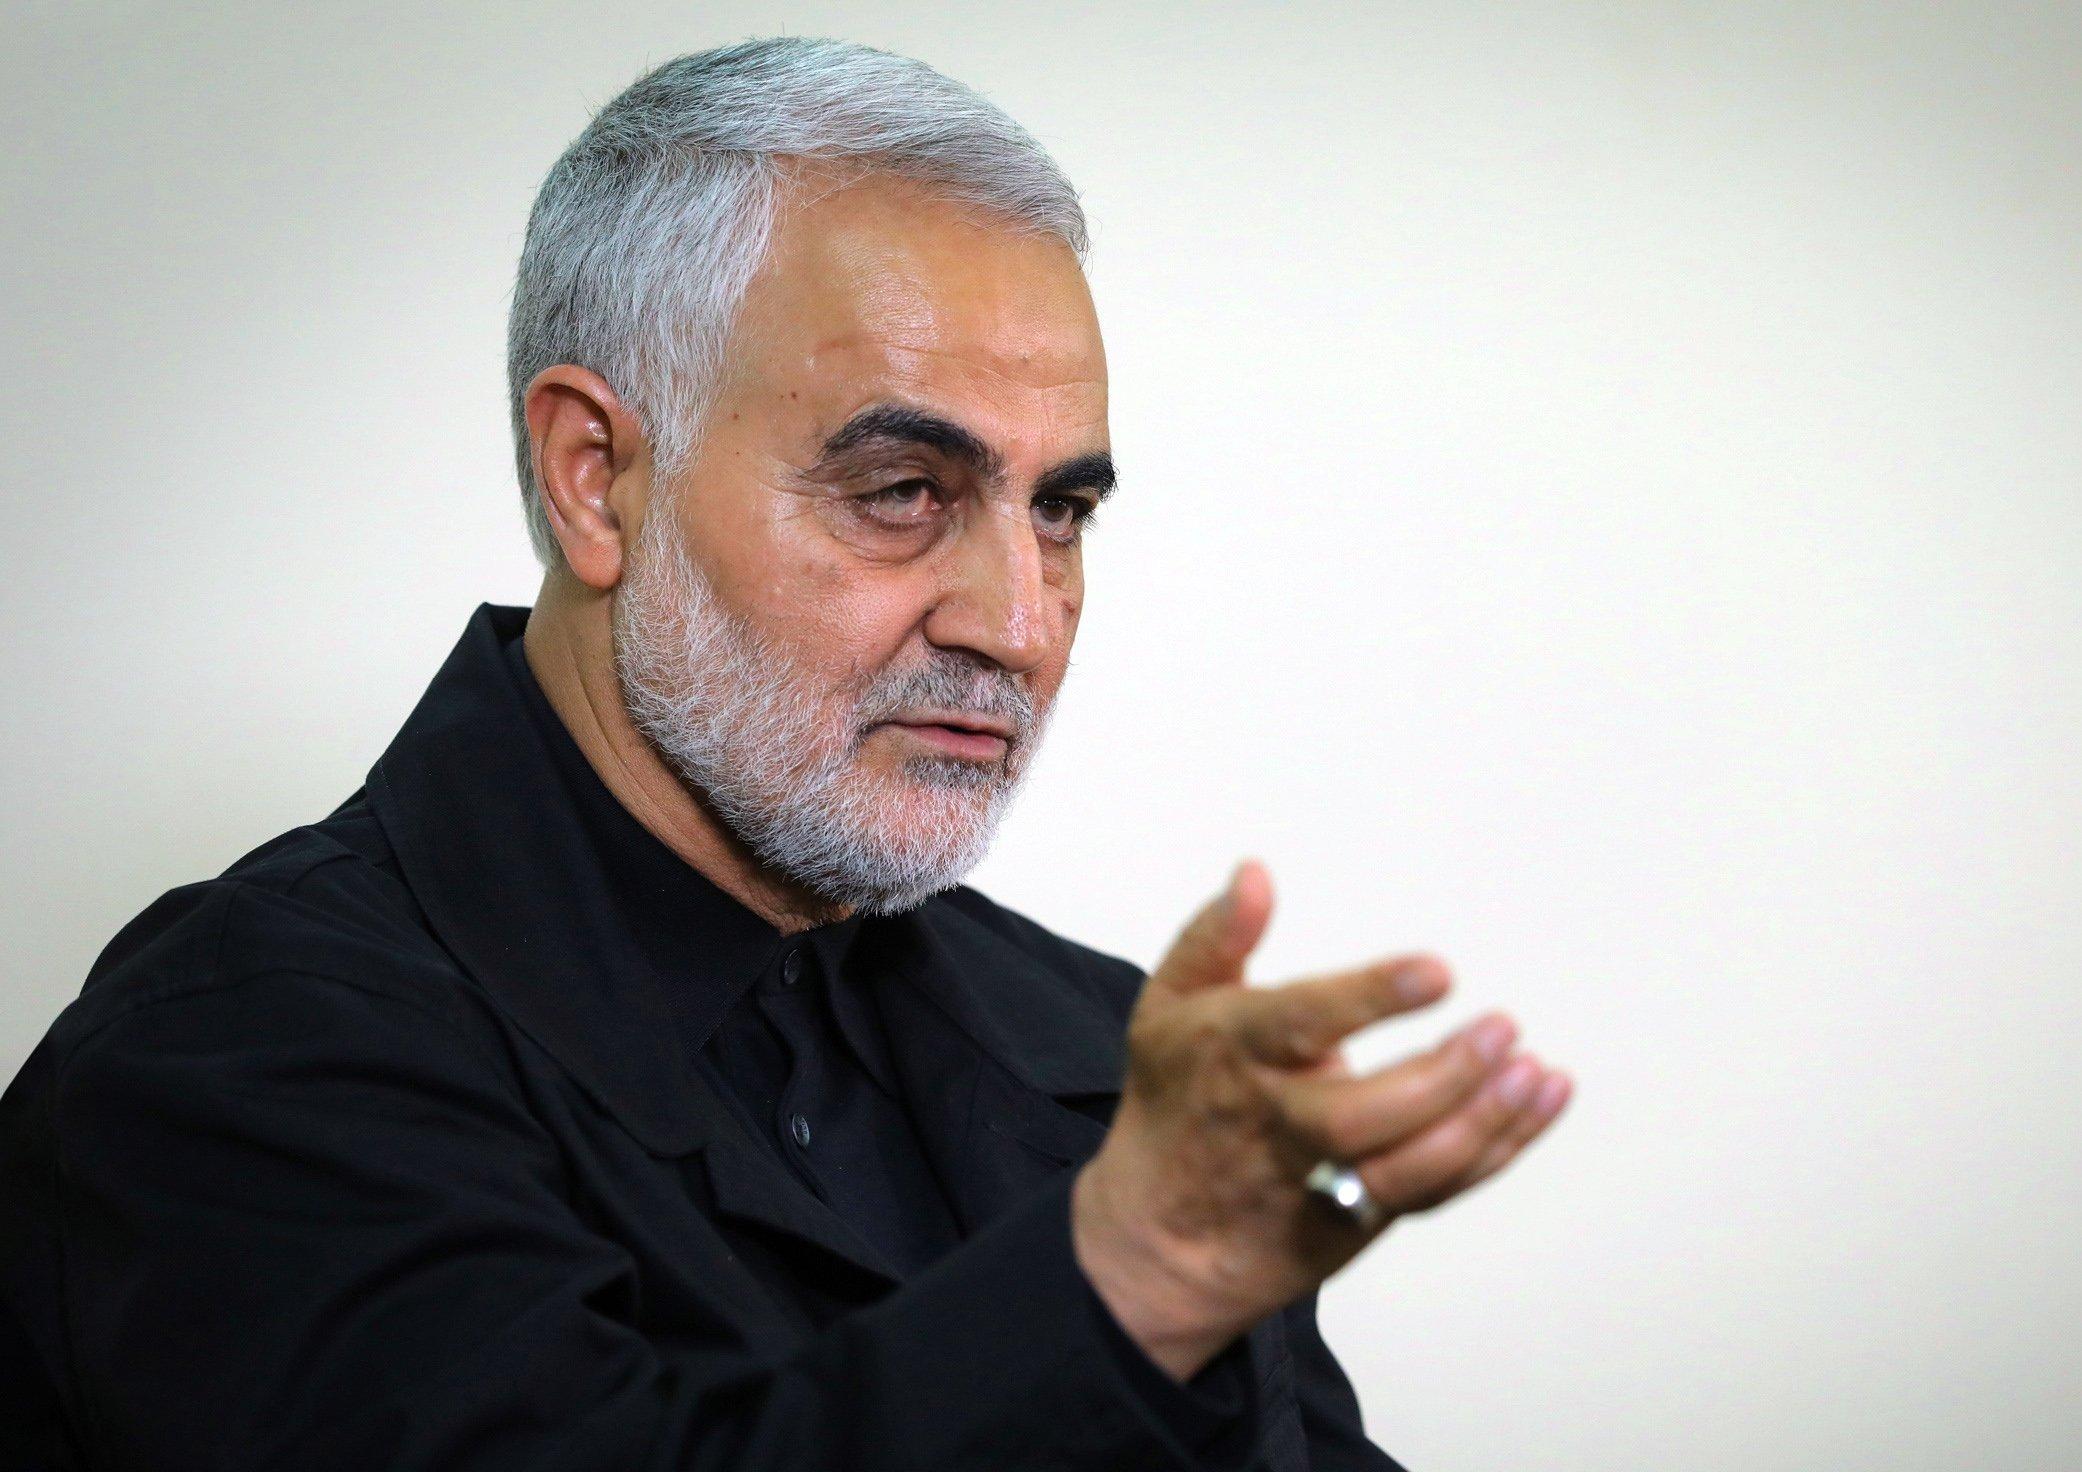 Qassem Soleimani is speaking during an interview with members of the Iranian leader's bureau in Tehran, Iran, Oct. 1, 2019. (KHAMENEI.IR / AFP)